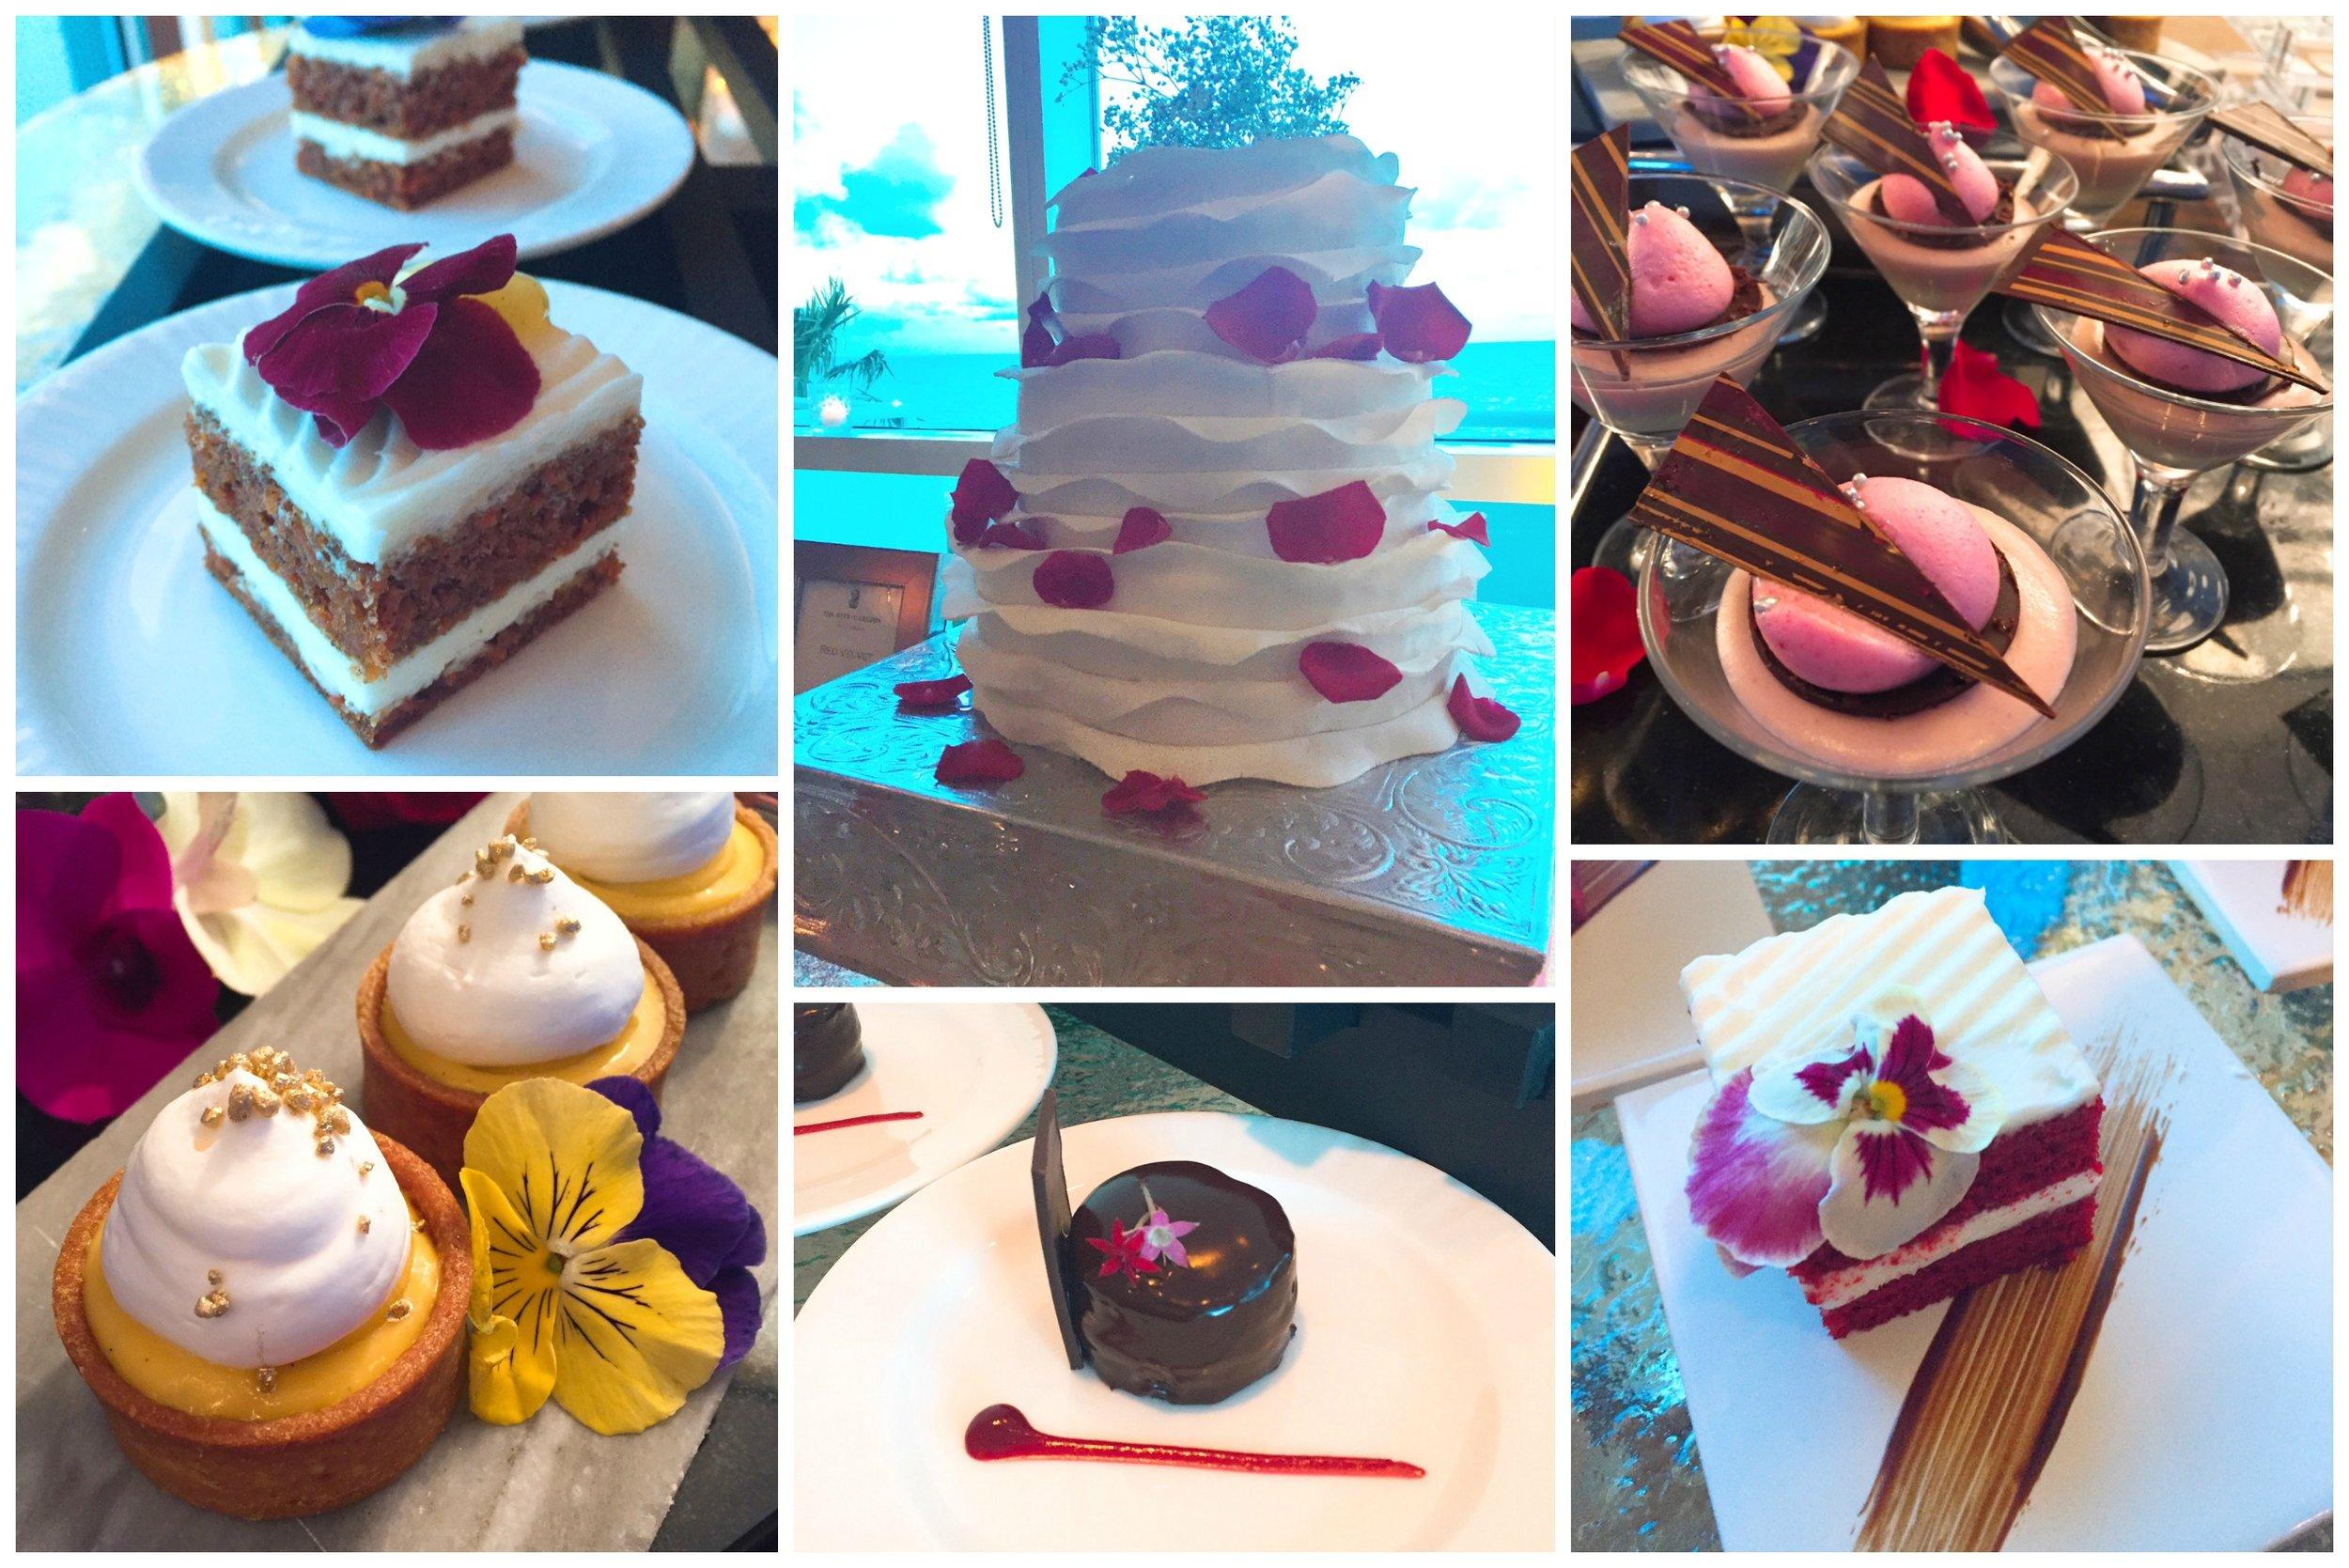 Saturday Sweets Ritz Carlton Fort Lauderdale Dessert Showcase